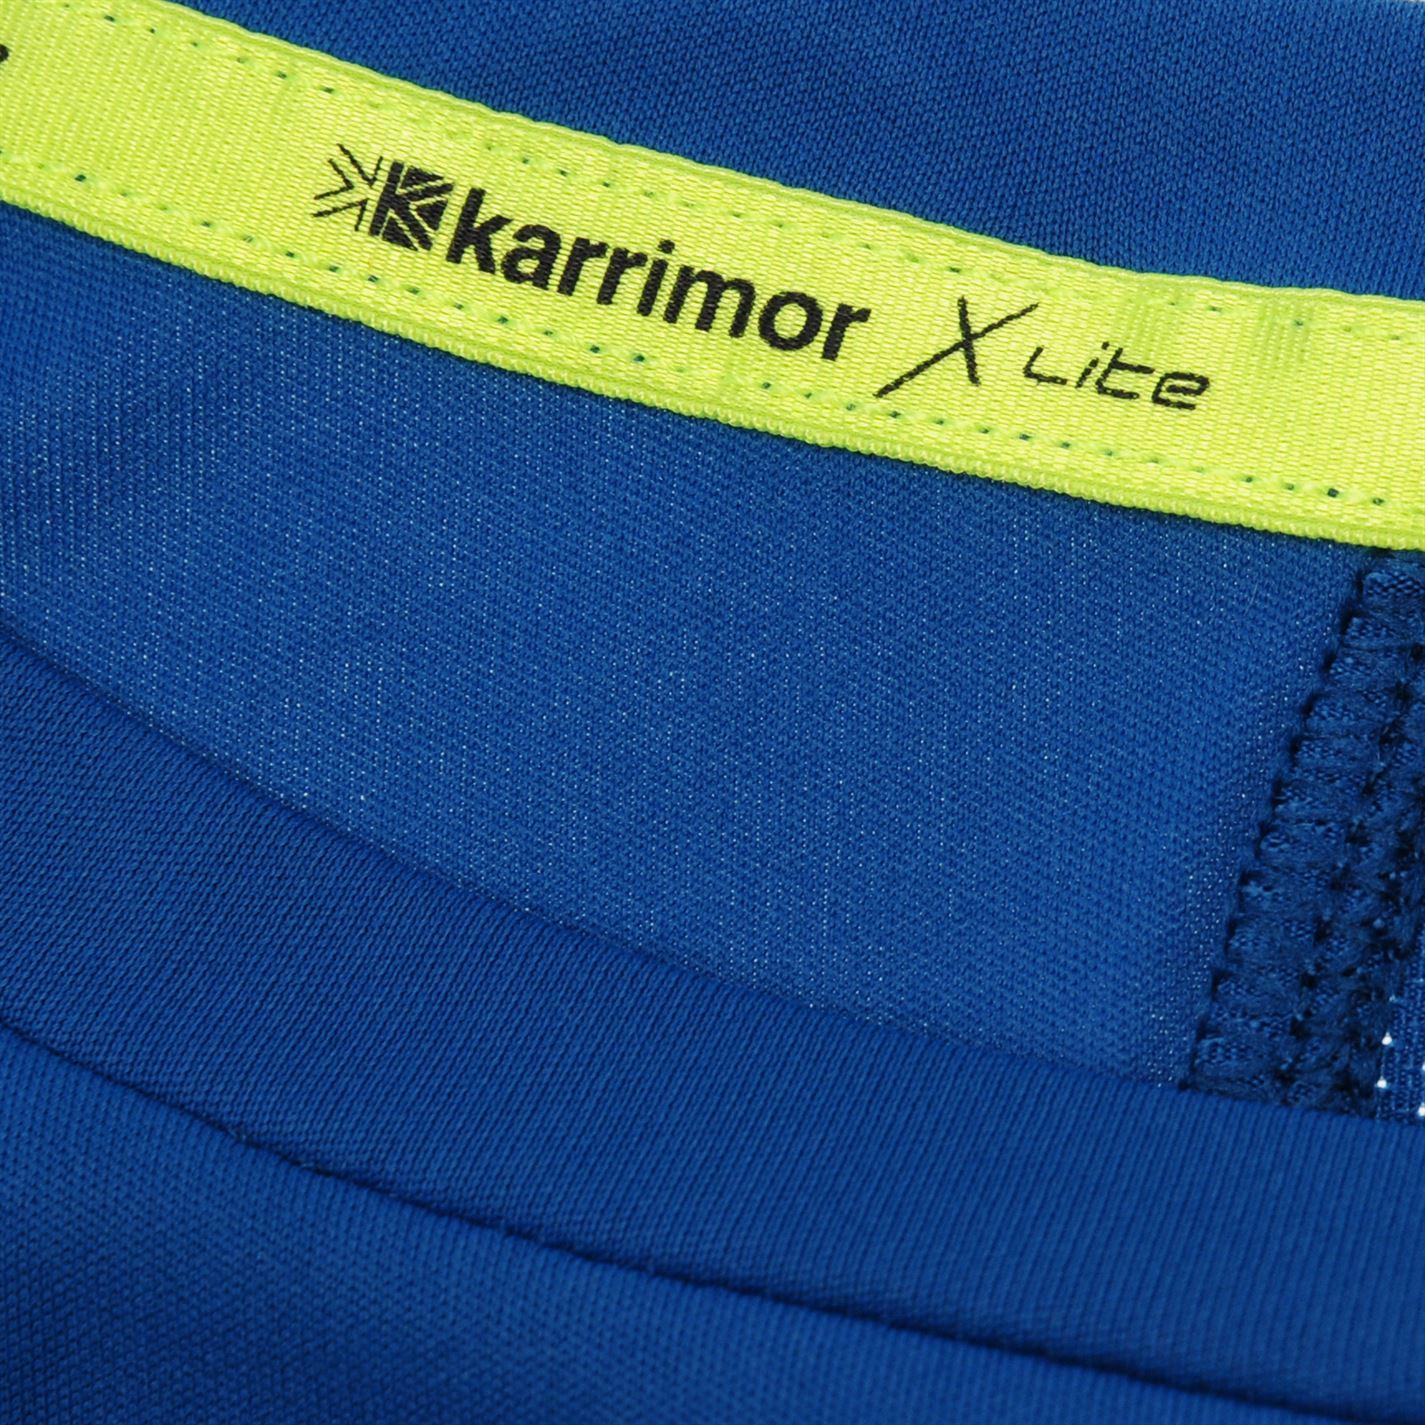 Karrimor-Hombres-X-Lite-Camiseta-mangas-cortas-de-carrera-Rendimiento-Camiseta-Top-Cuello-Redondo miniatura 23